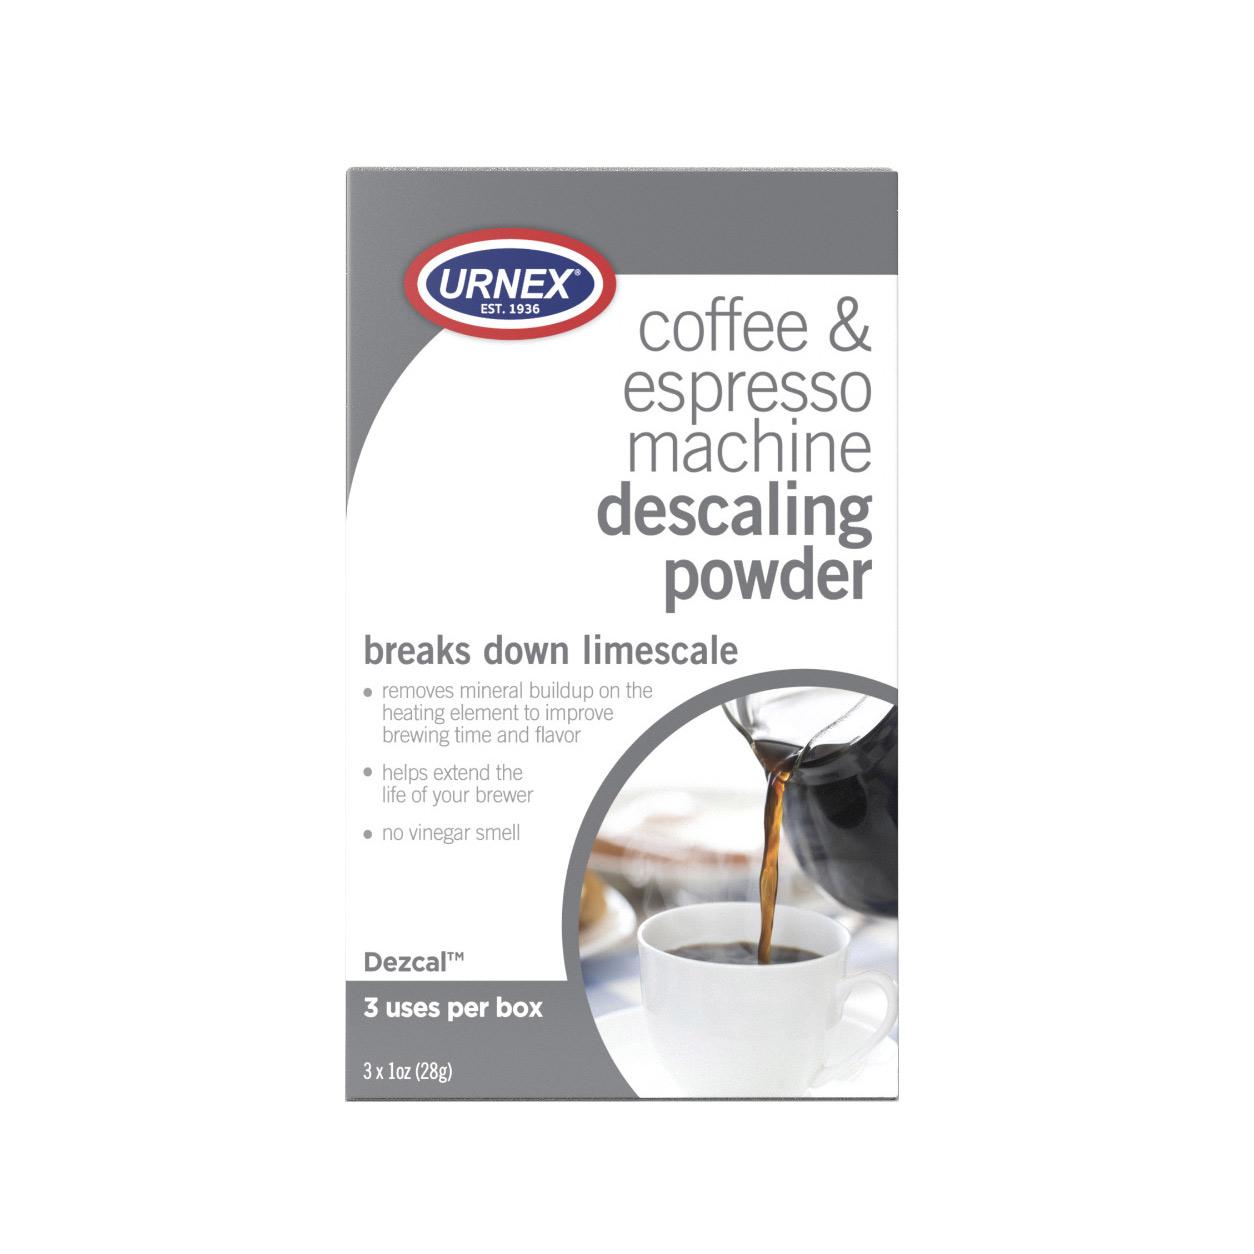 Urnex Dezcal Coffee and Espresso Machine Descaling Powder